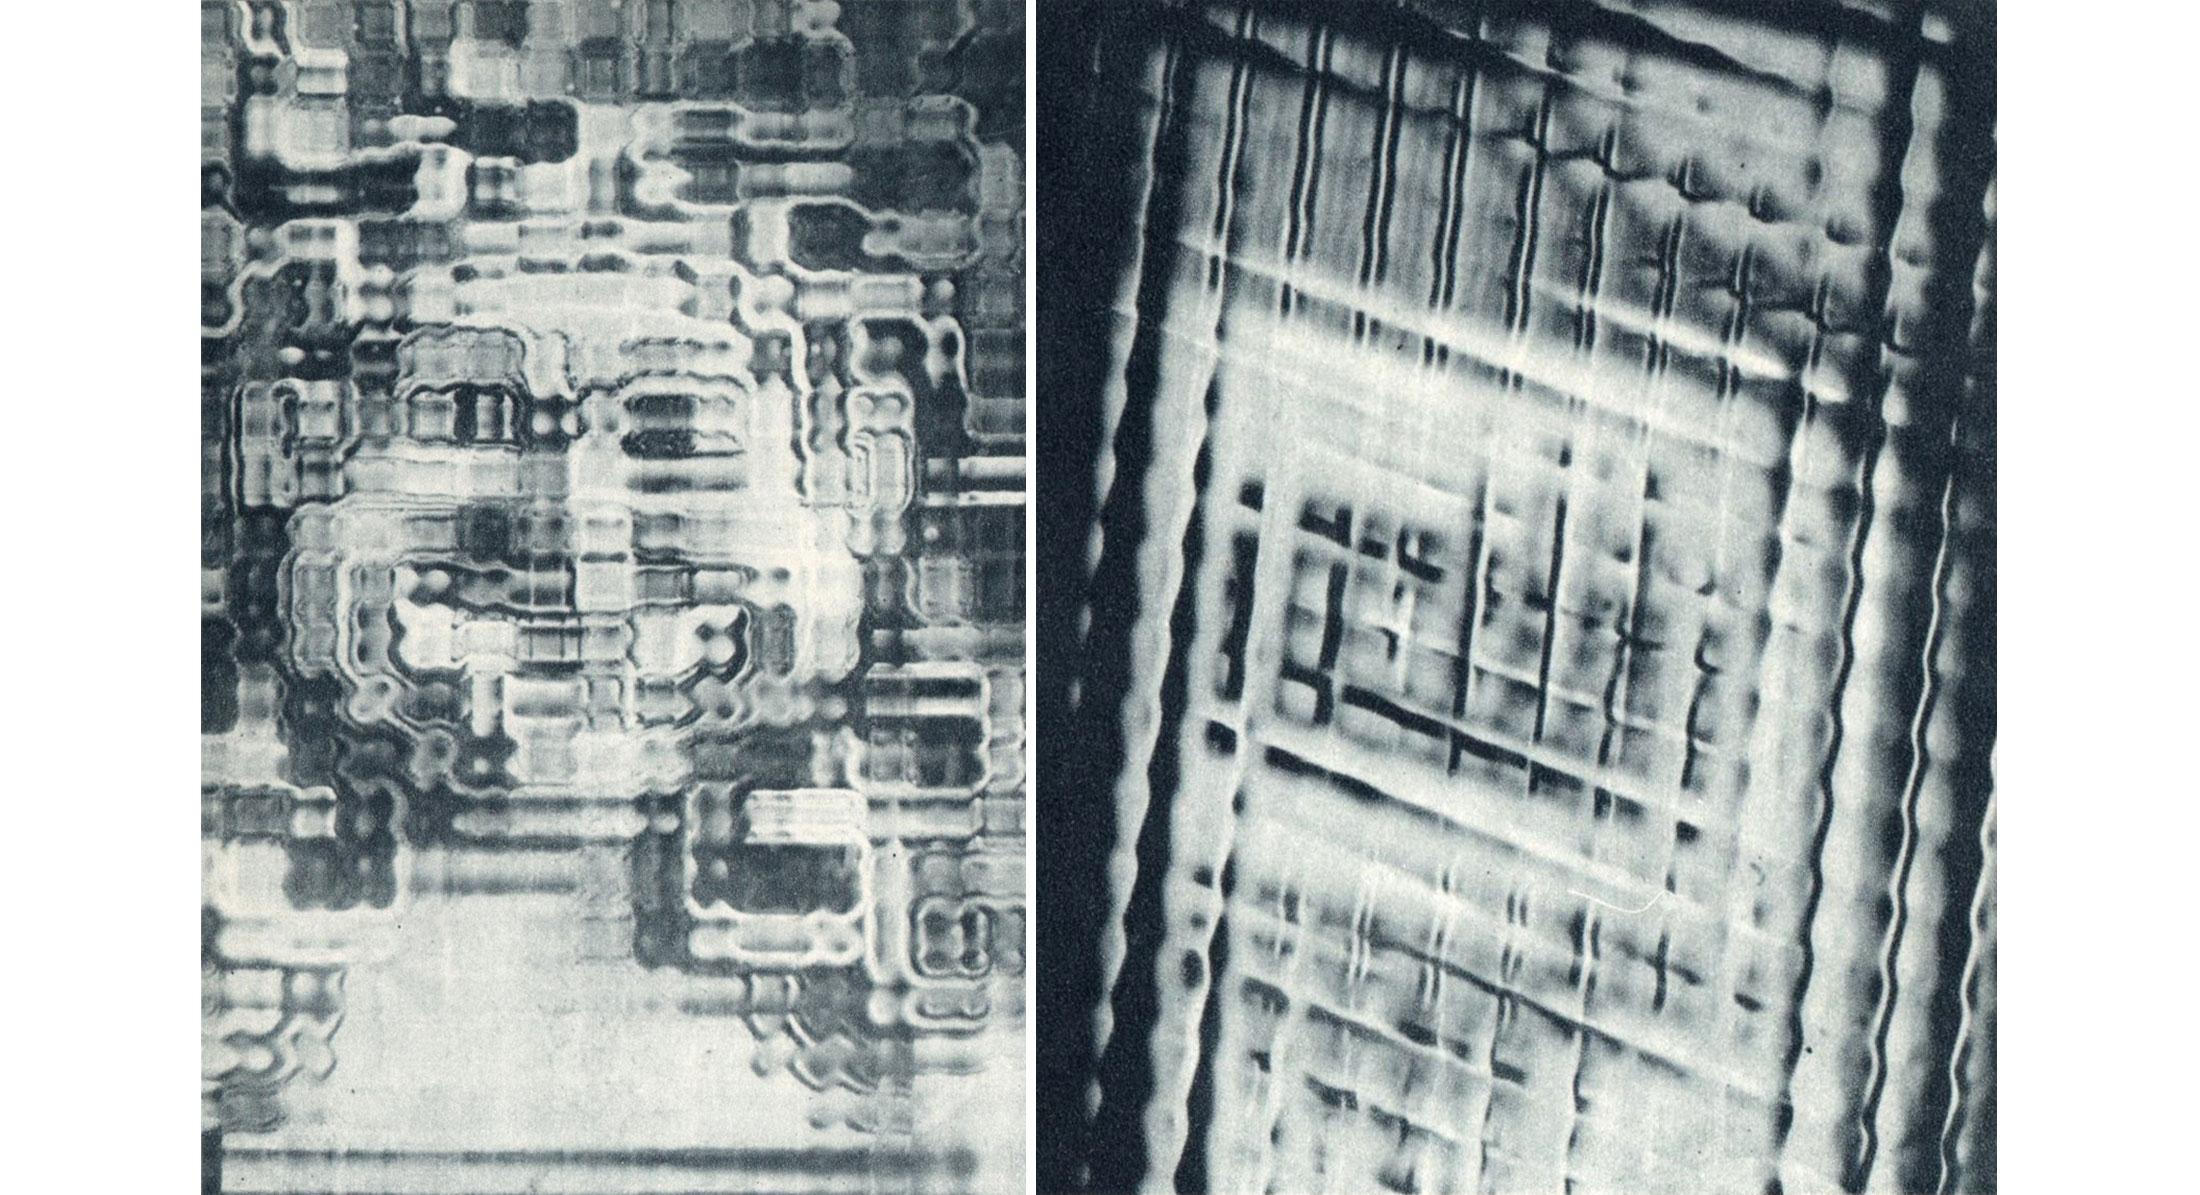 Raymond-Hains-graphisme-et-photographie-magazine-prisma-5-photographie-hypnagogique-04